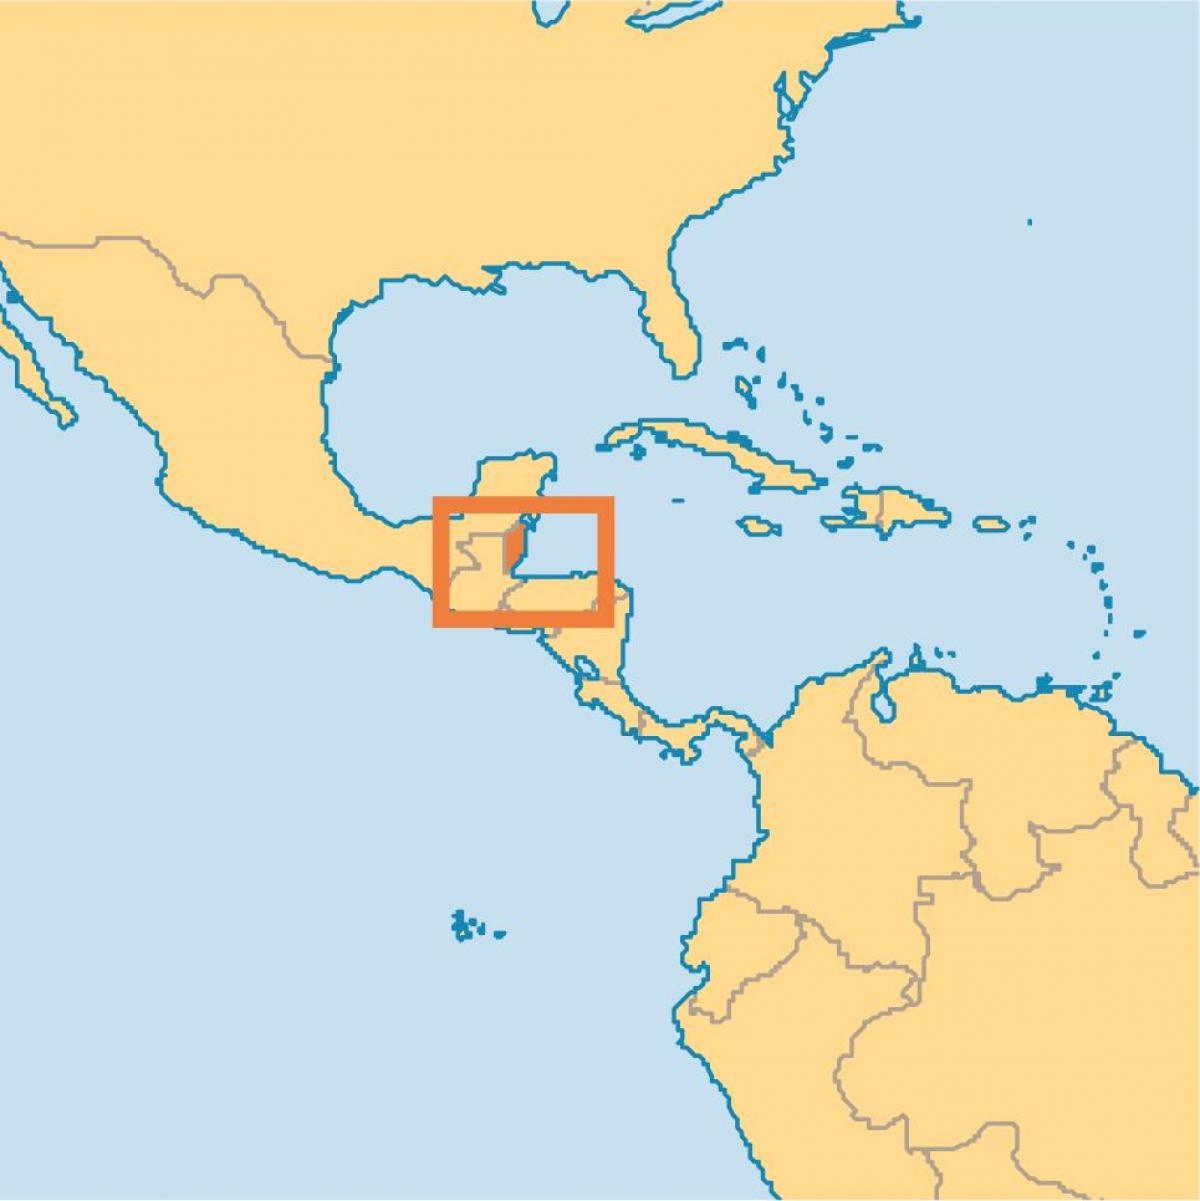 Belize World Map Belize Location On World Map Central America